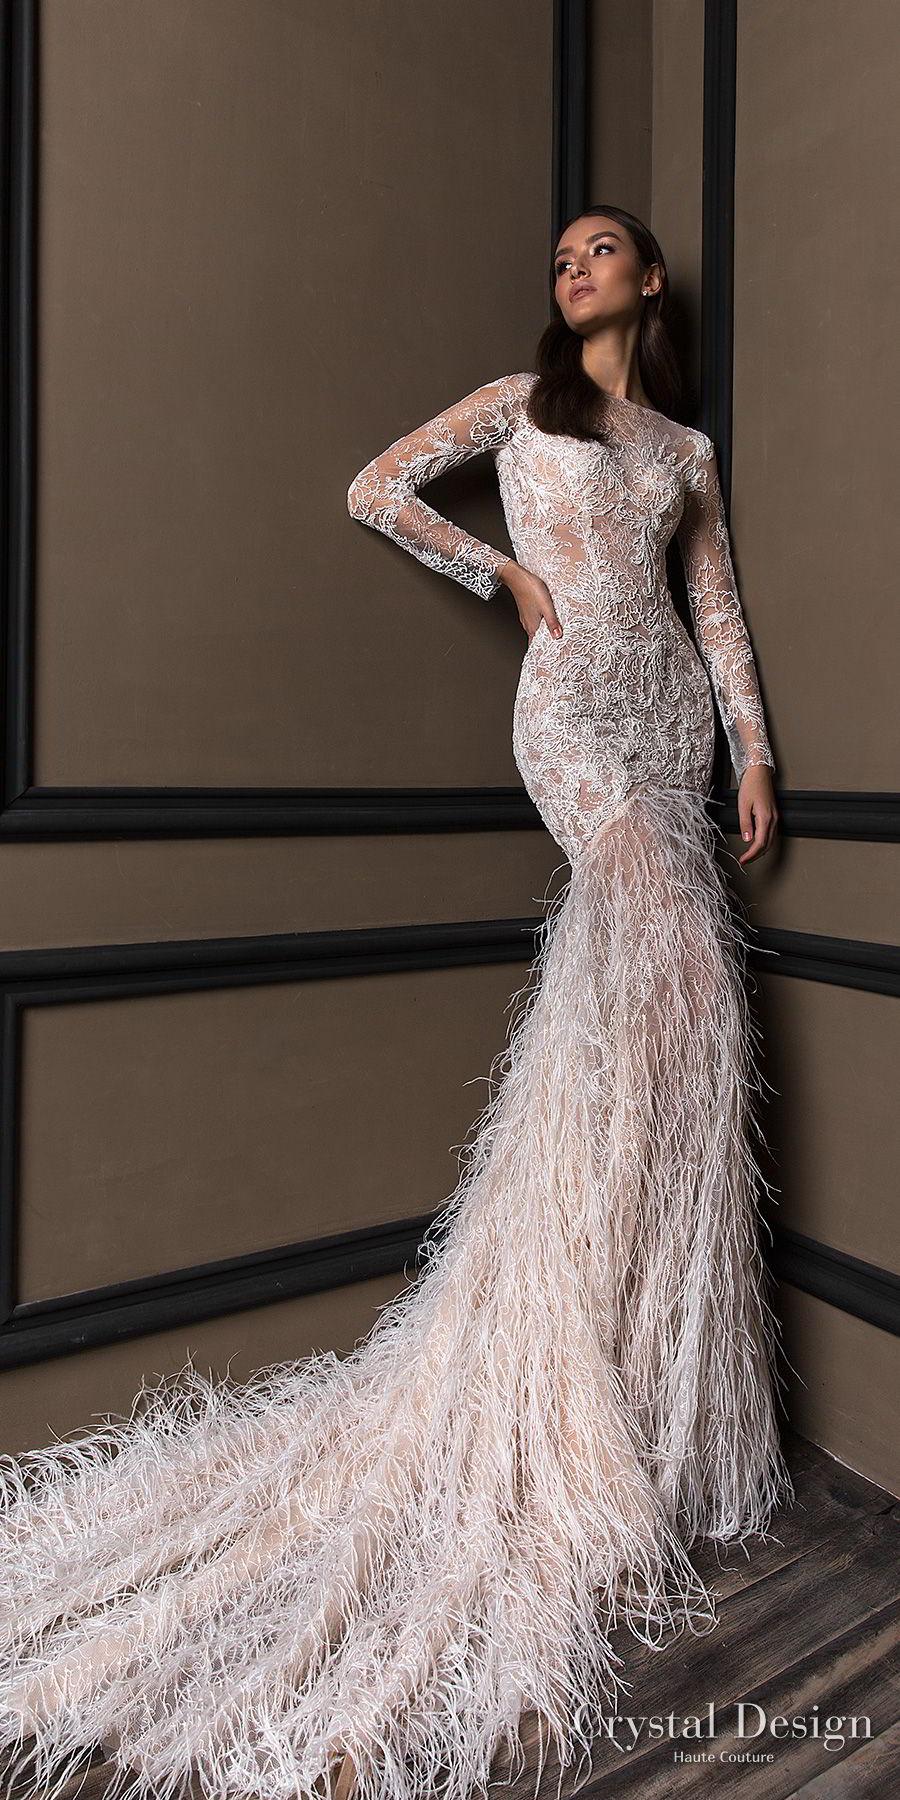 crystal design 2018 long sleeves bateau neck full embellishment finge skirt glamorous mermaid wedding dress lace back chapel train (ibbi) mv